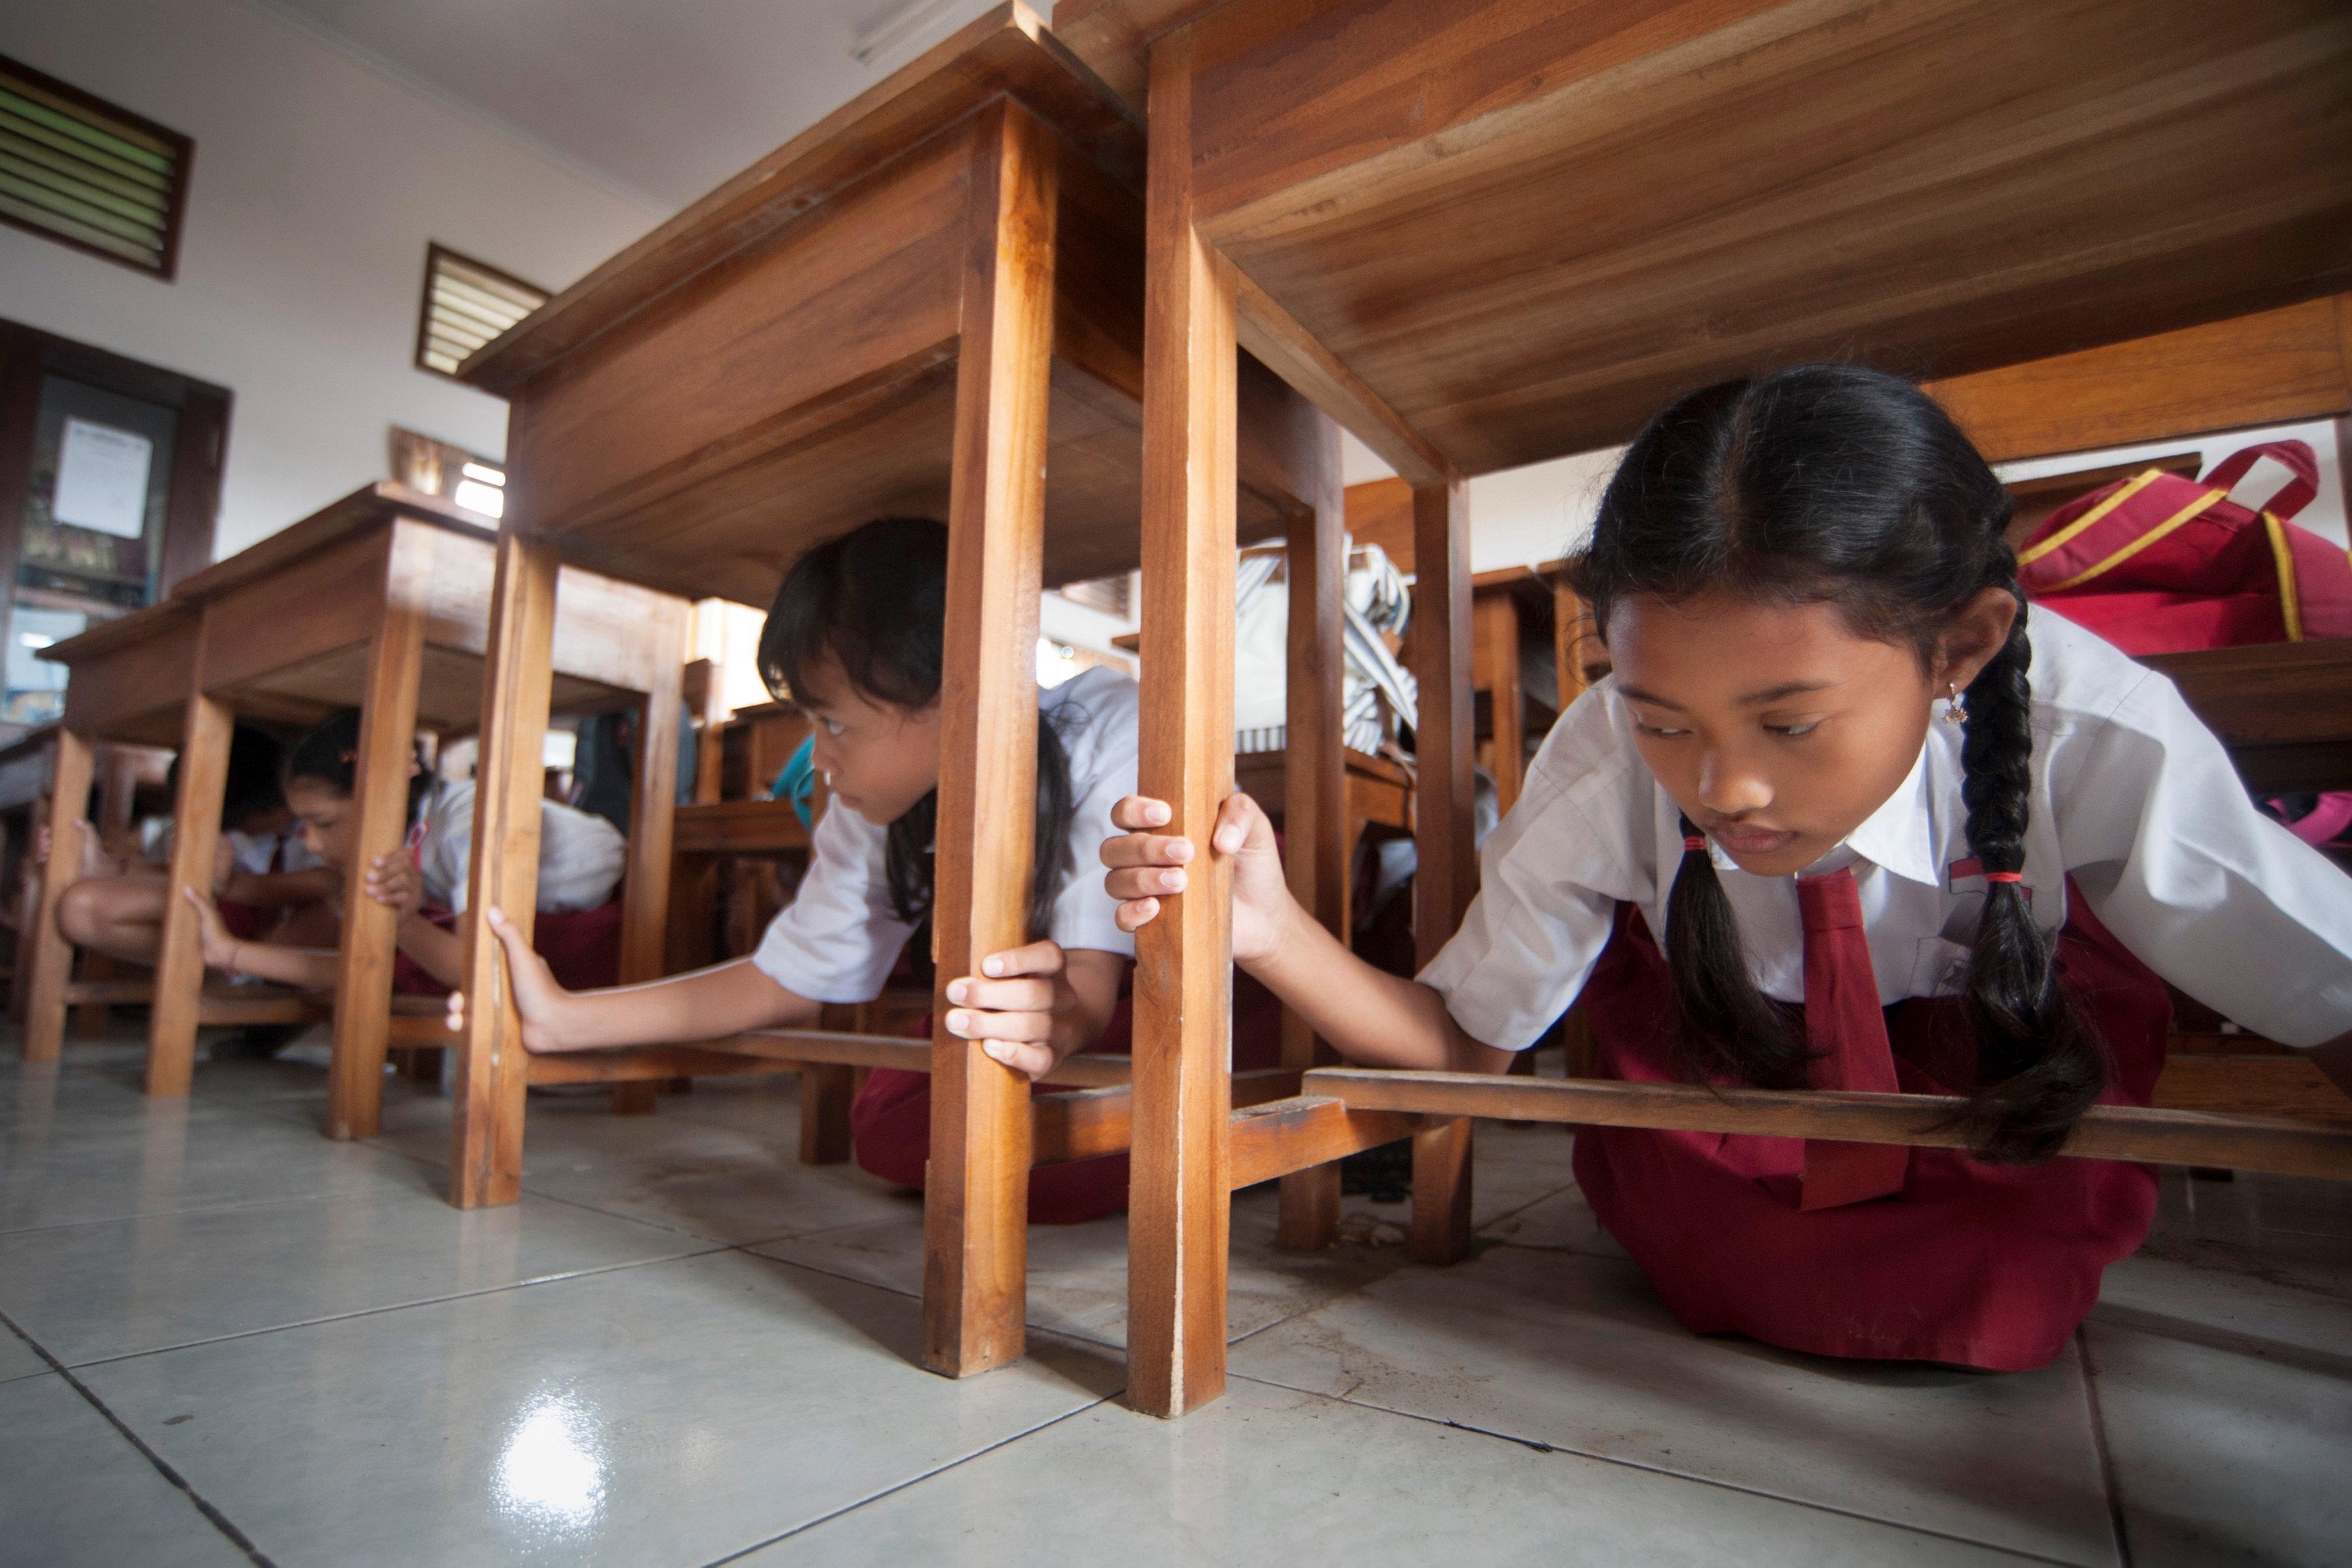 Bali's Tanjung Benoa 2 elementary holds tsunami drills for schoolchildren